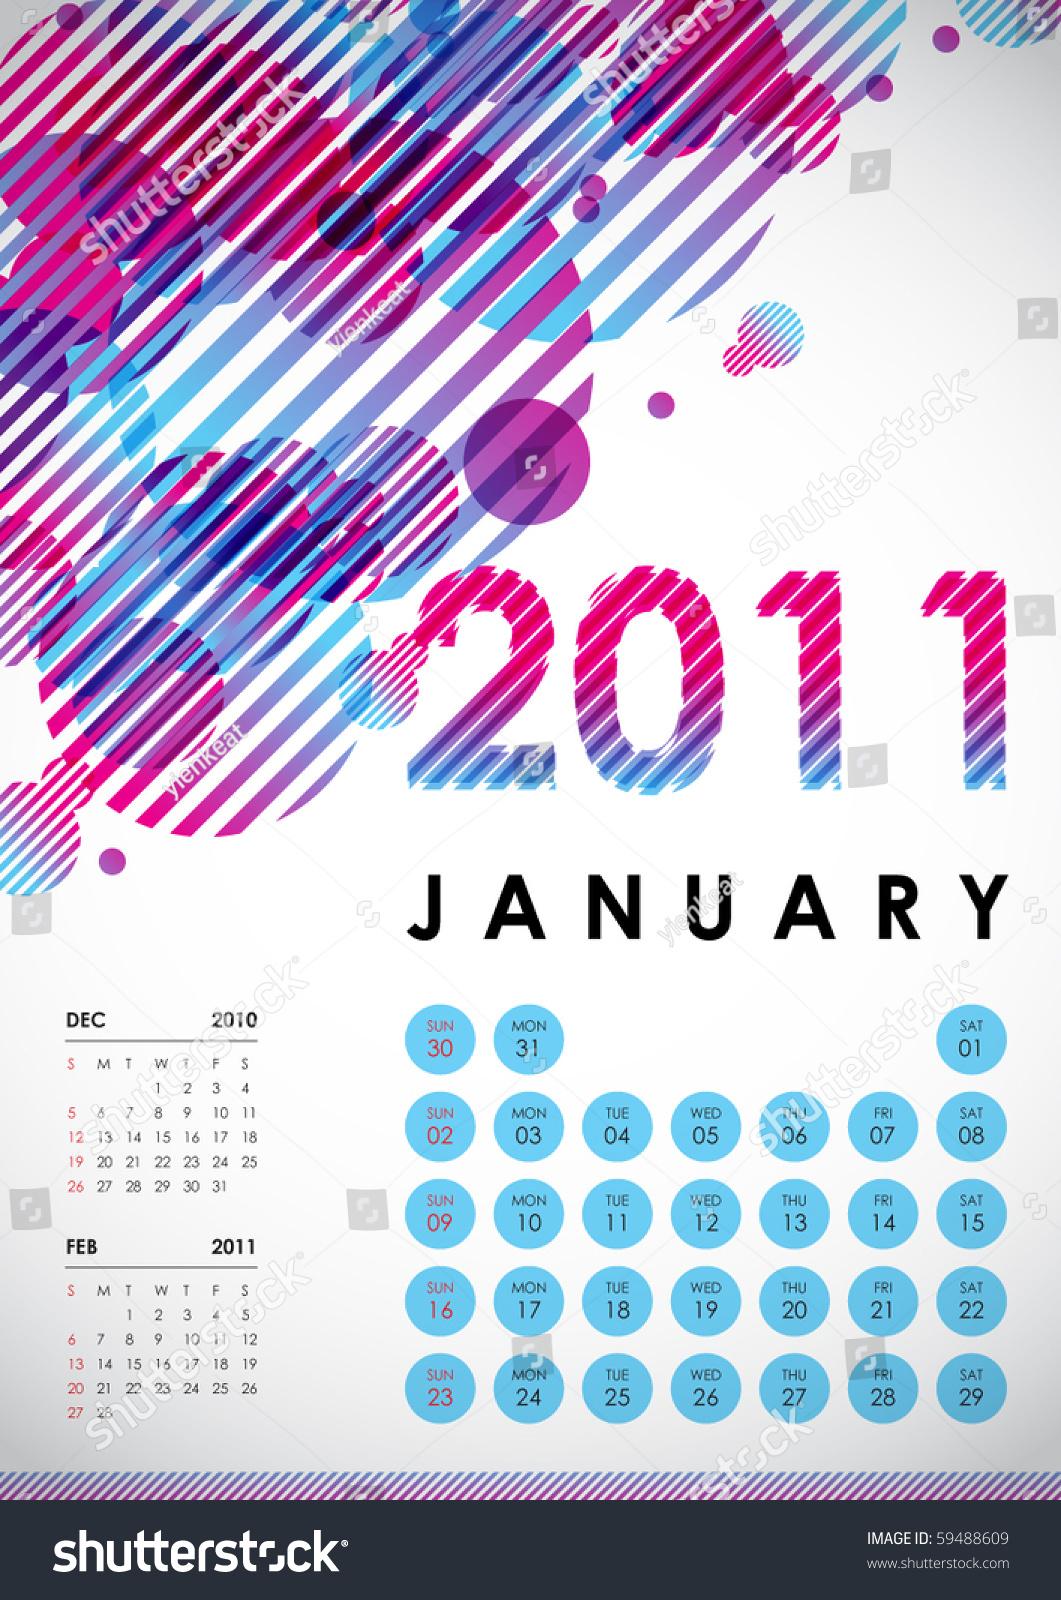 January Calendar Design : January calendar design stock vector illustration